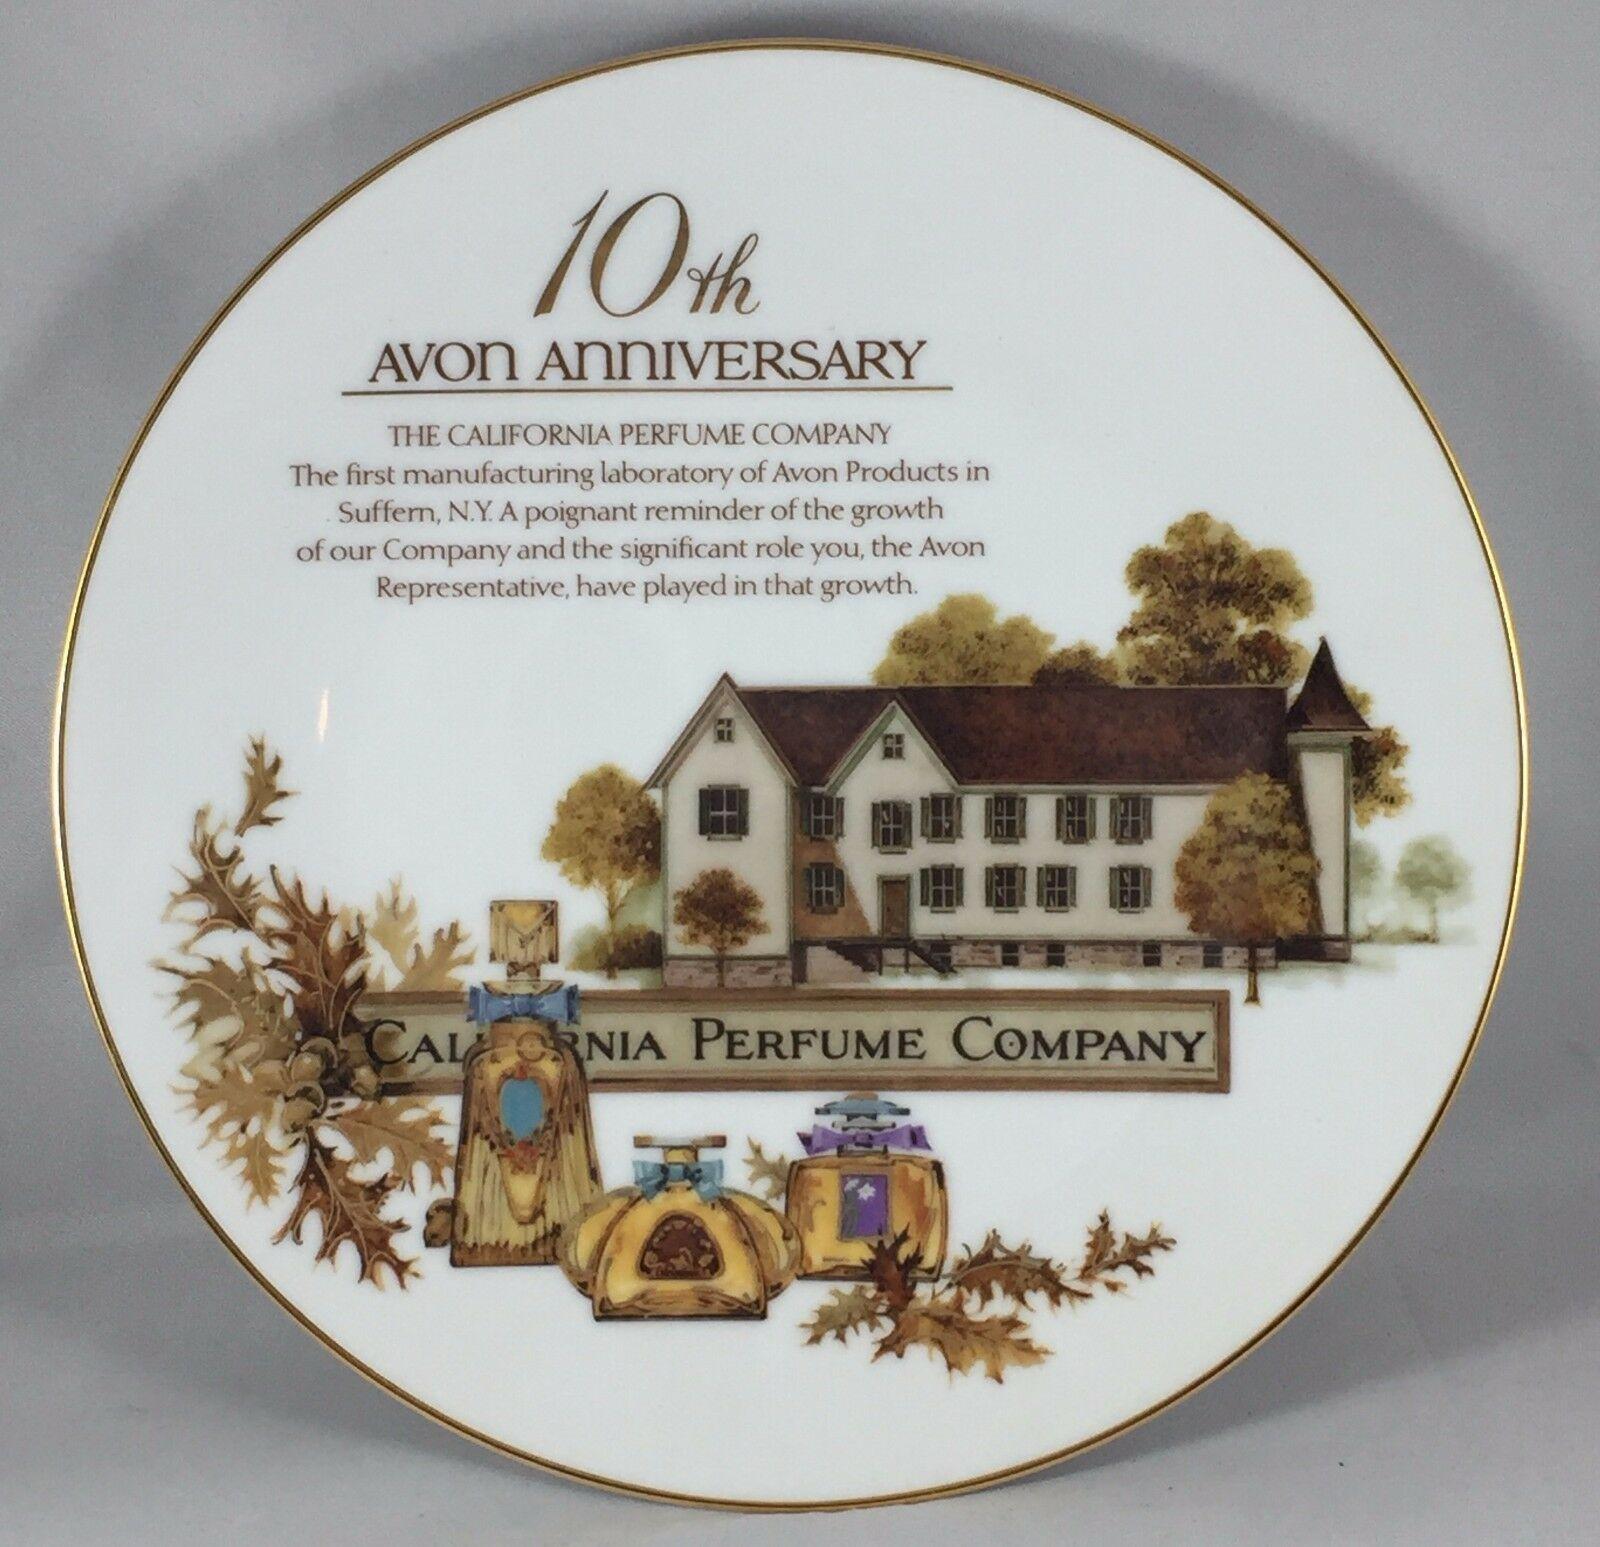 1990 Avon Porcelain Award Plate 10th Anniversary-California Perfume Company